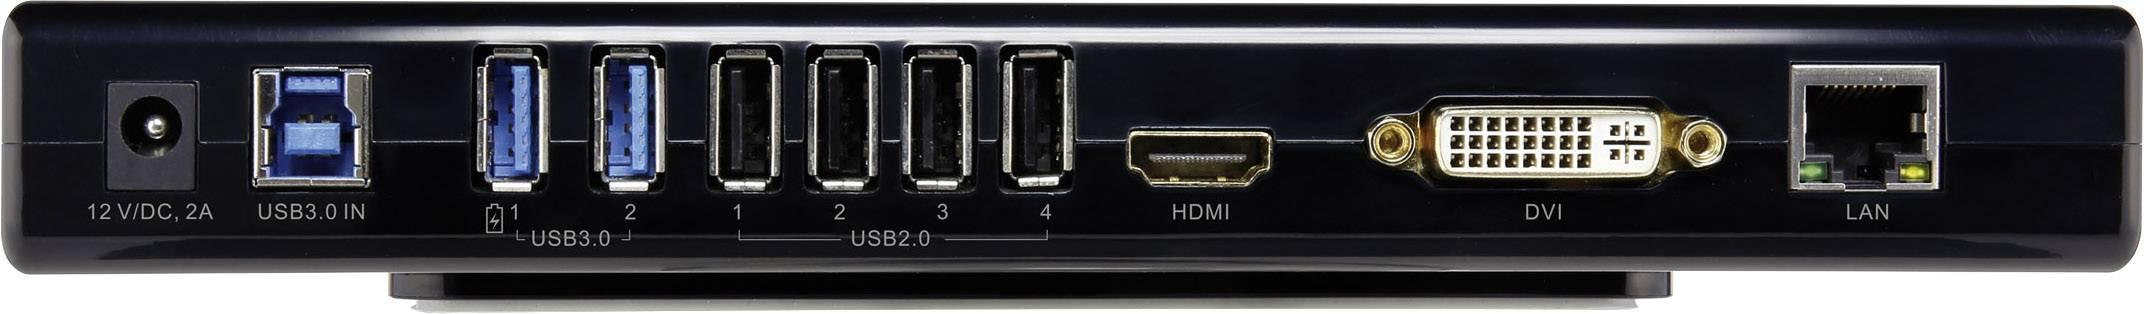 Univerzálna dokovacia stanica RENKFORCE, USB 3.0, LAN, DVI, HDMI